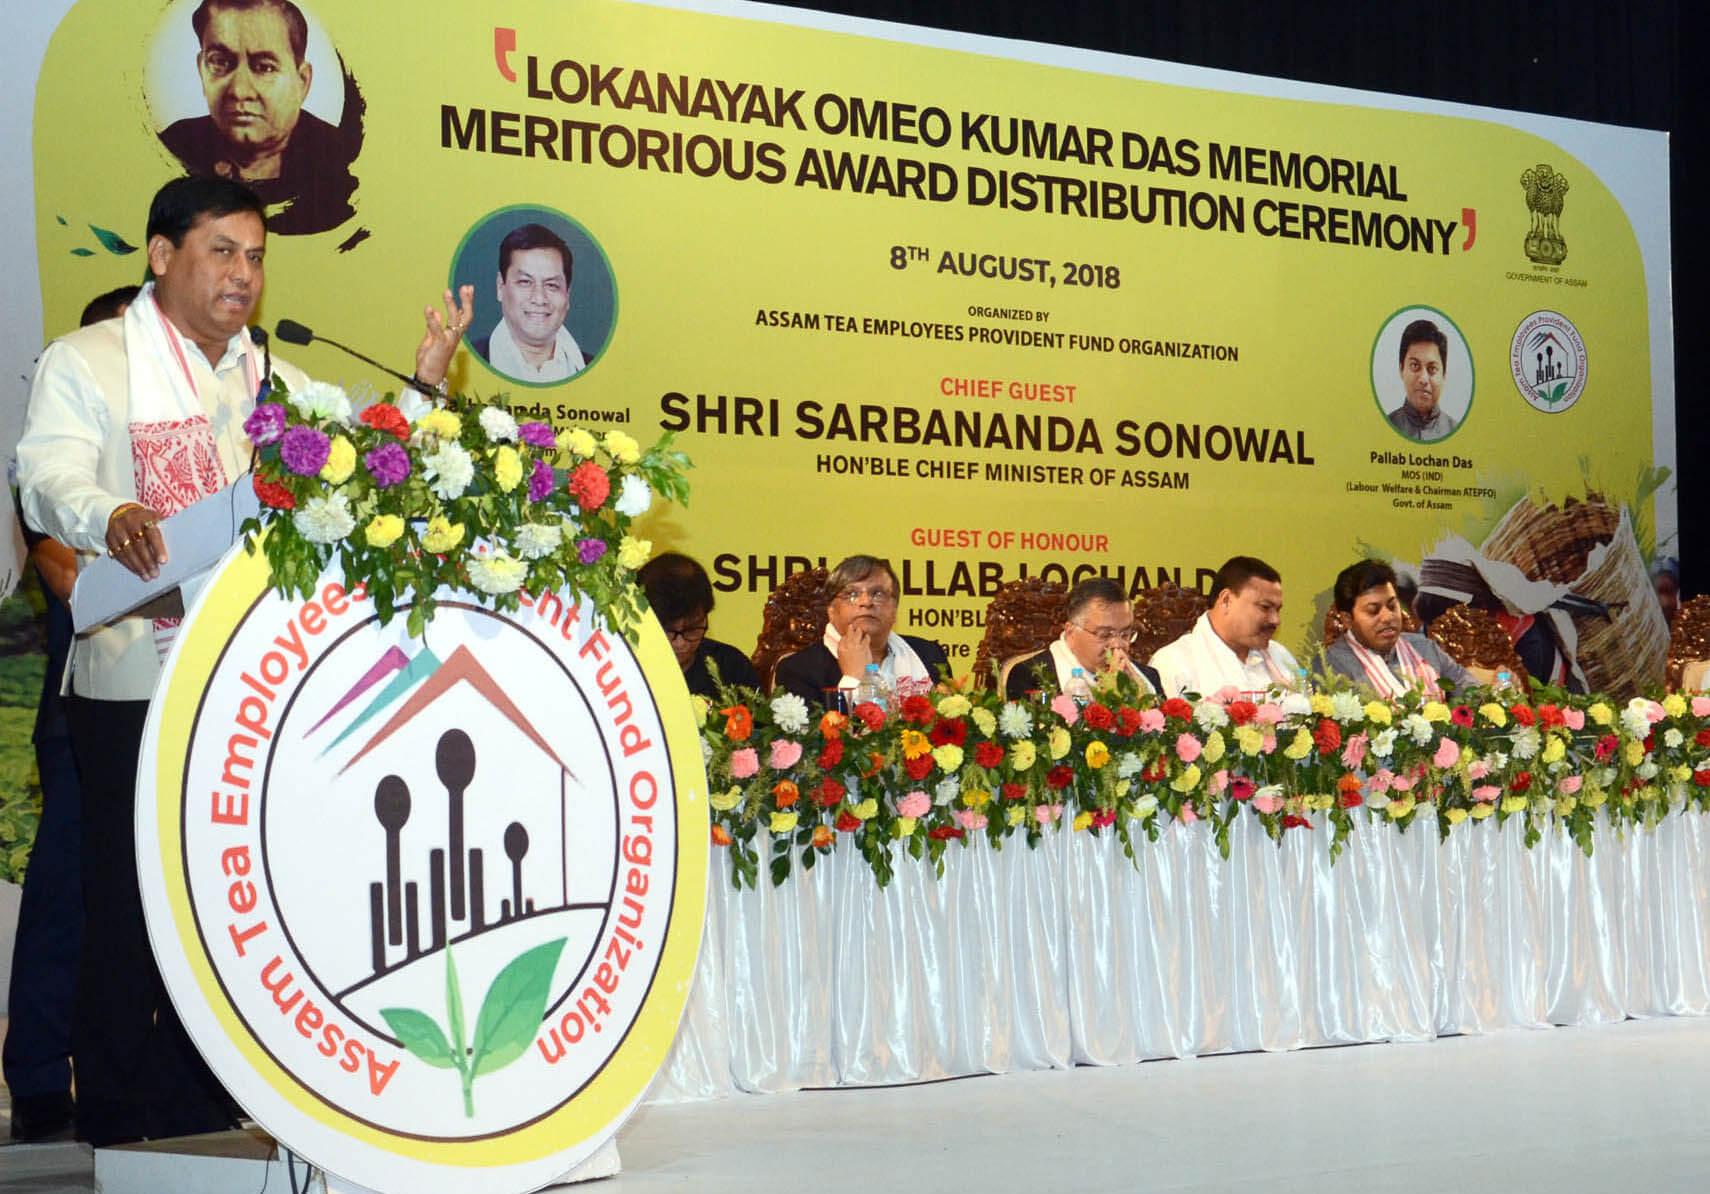 Chief Minister Sarbananda Sonowal Gives Away Lokanayak Omeo Kumar Das Awards